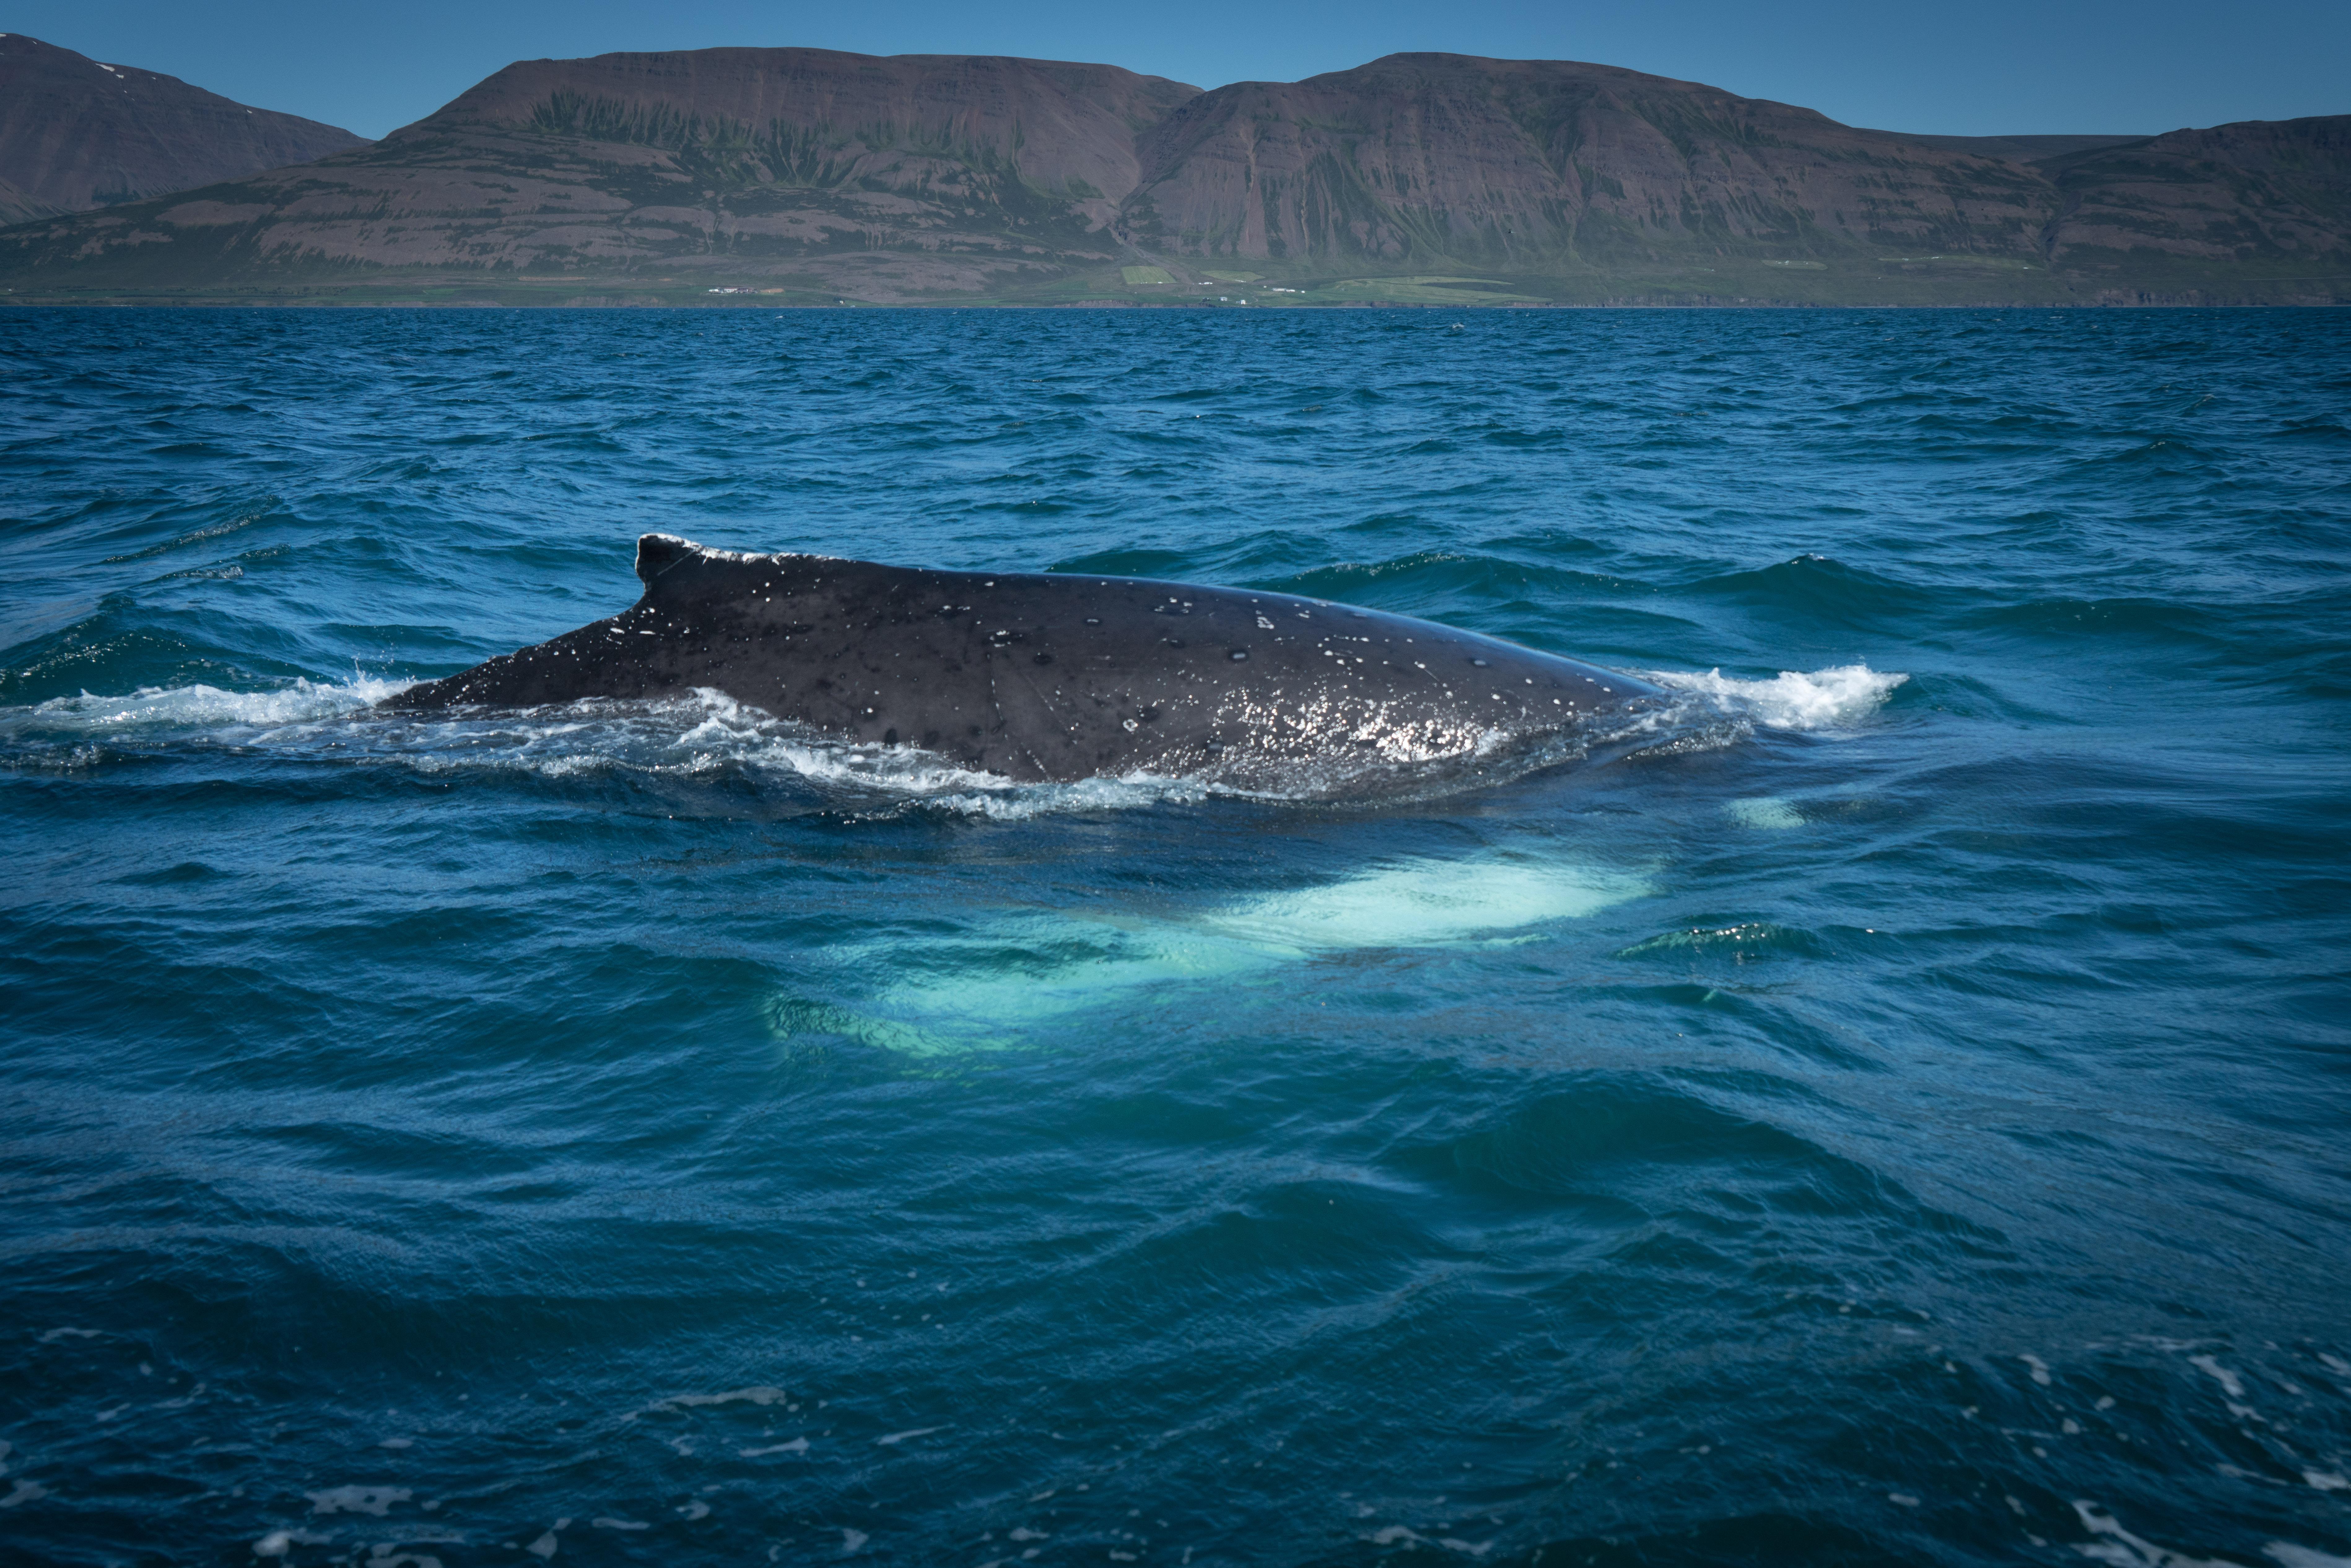 #whale, #humpback, #fjord, #akureyri, #rib, #whalewatch, #wildlife, #nature, #windstar